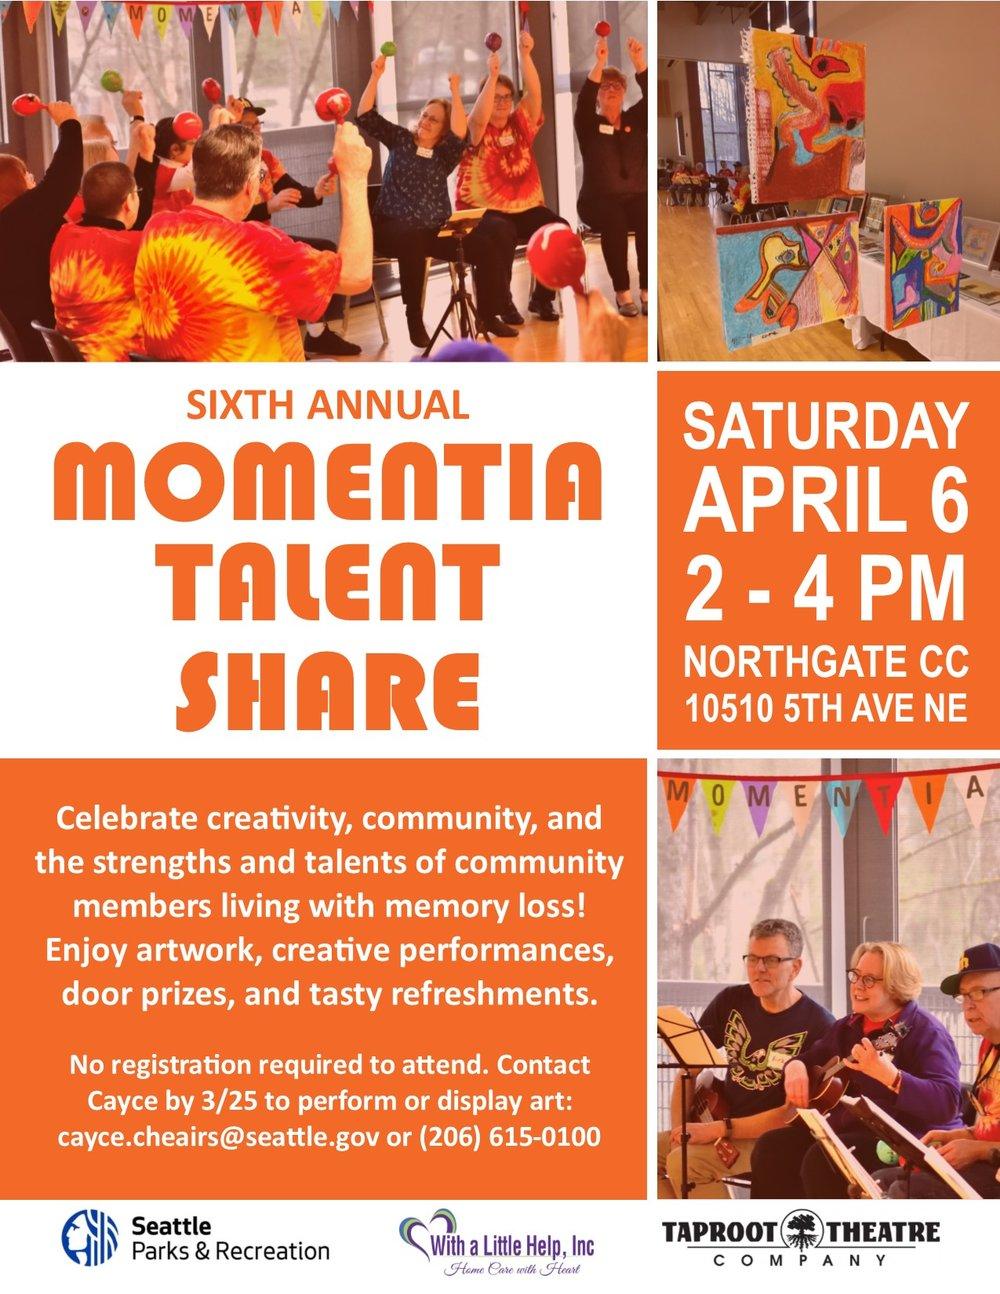 2019 Momentia Talent Share flyer.jpg